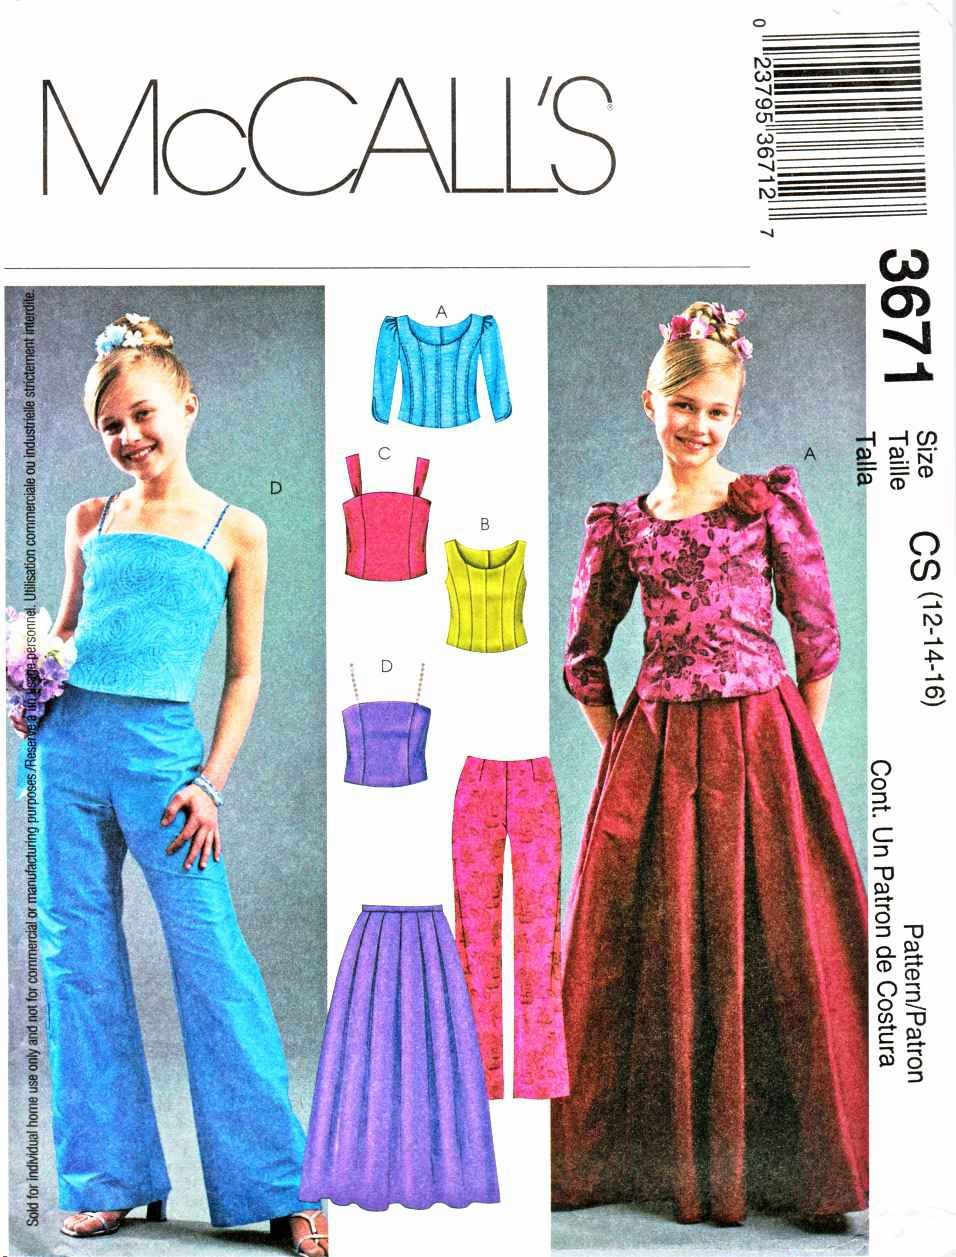 e02cd70b056a McCalls Sewing Pattern 3671 Girls Size 12-16 Formal Two Piece Dress Tops  Pants Skirt ...